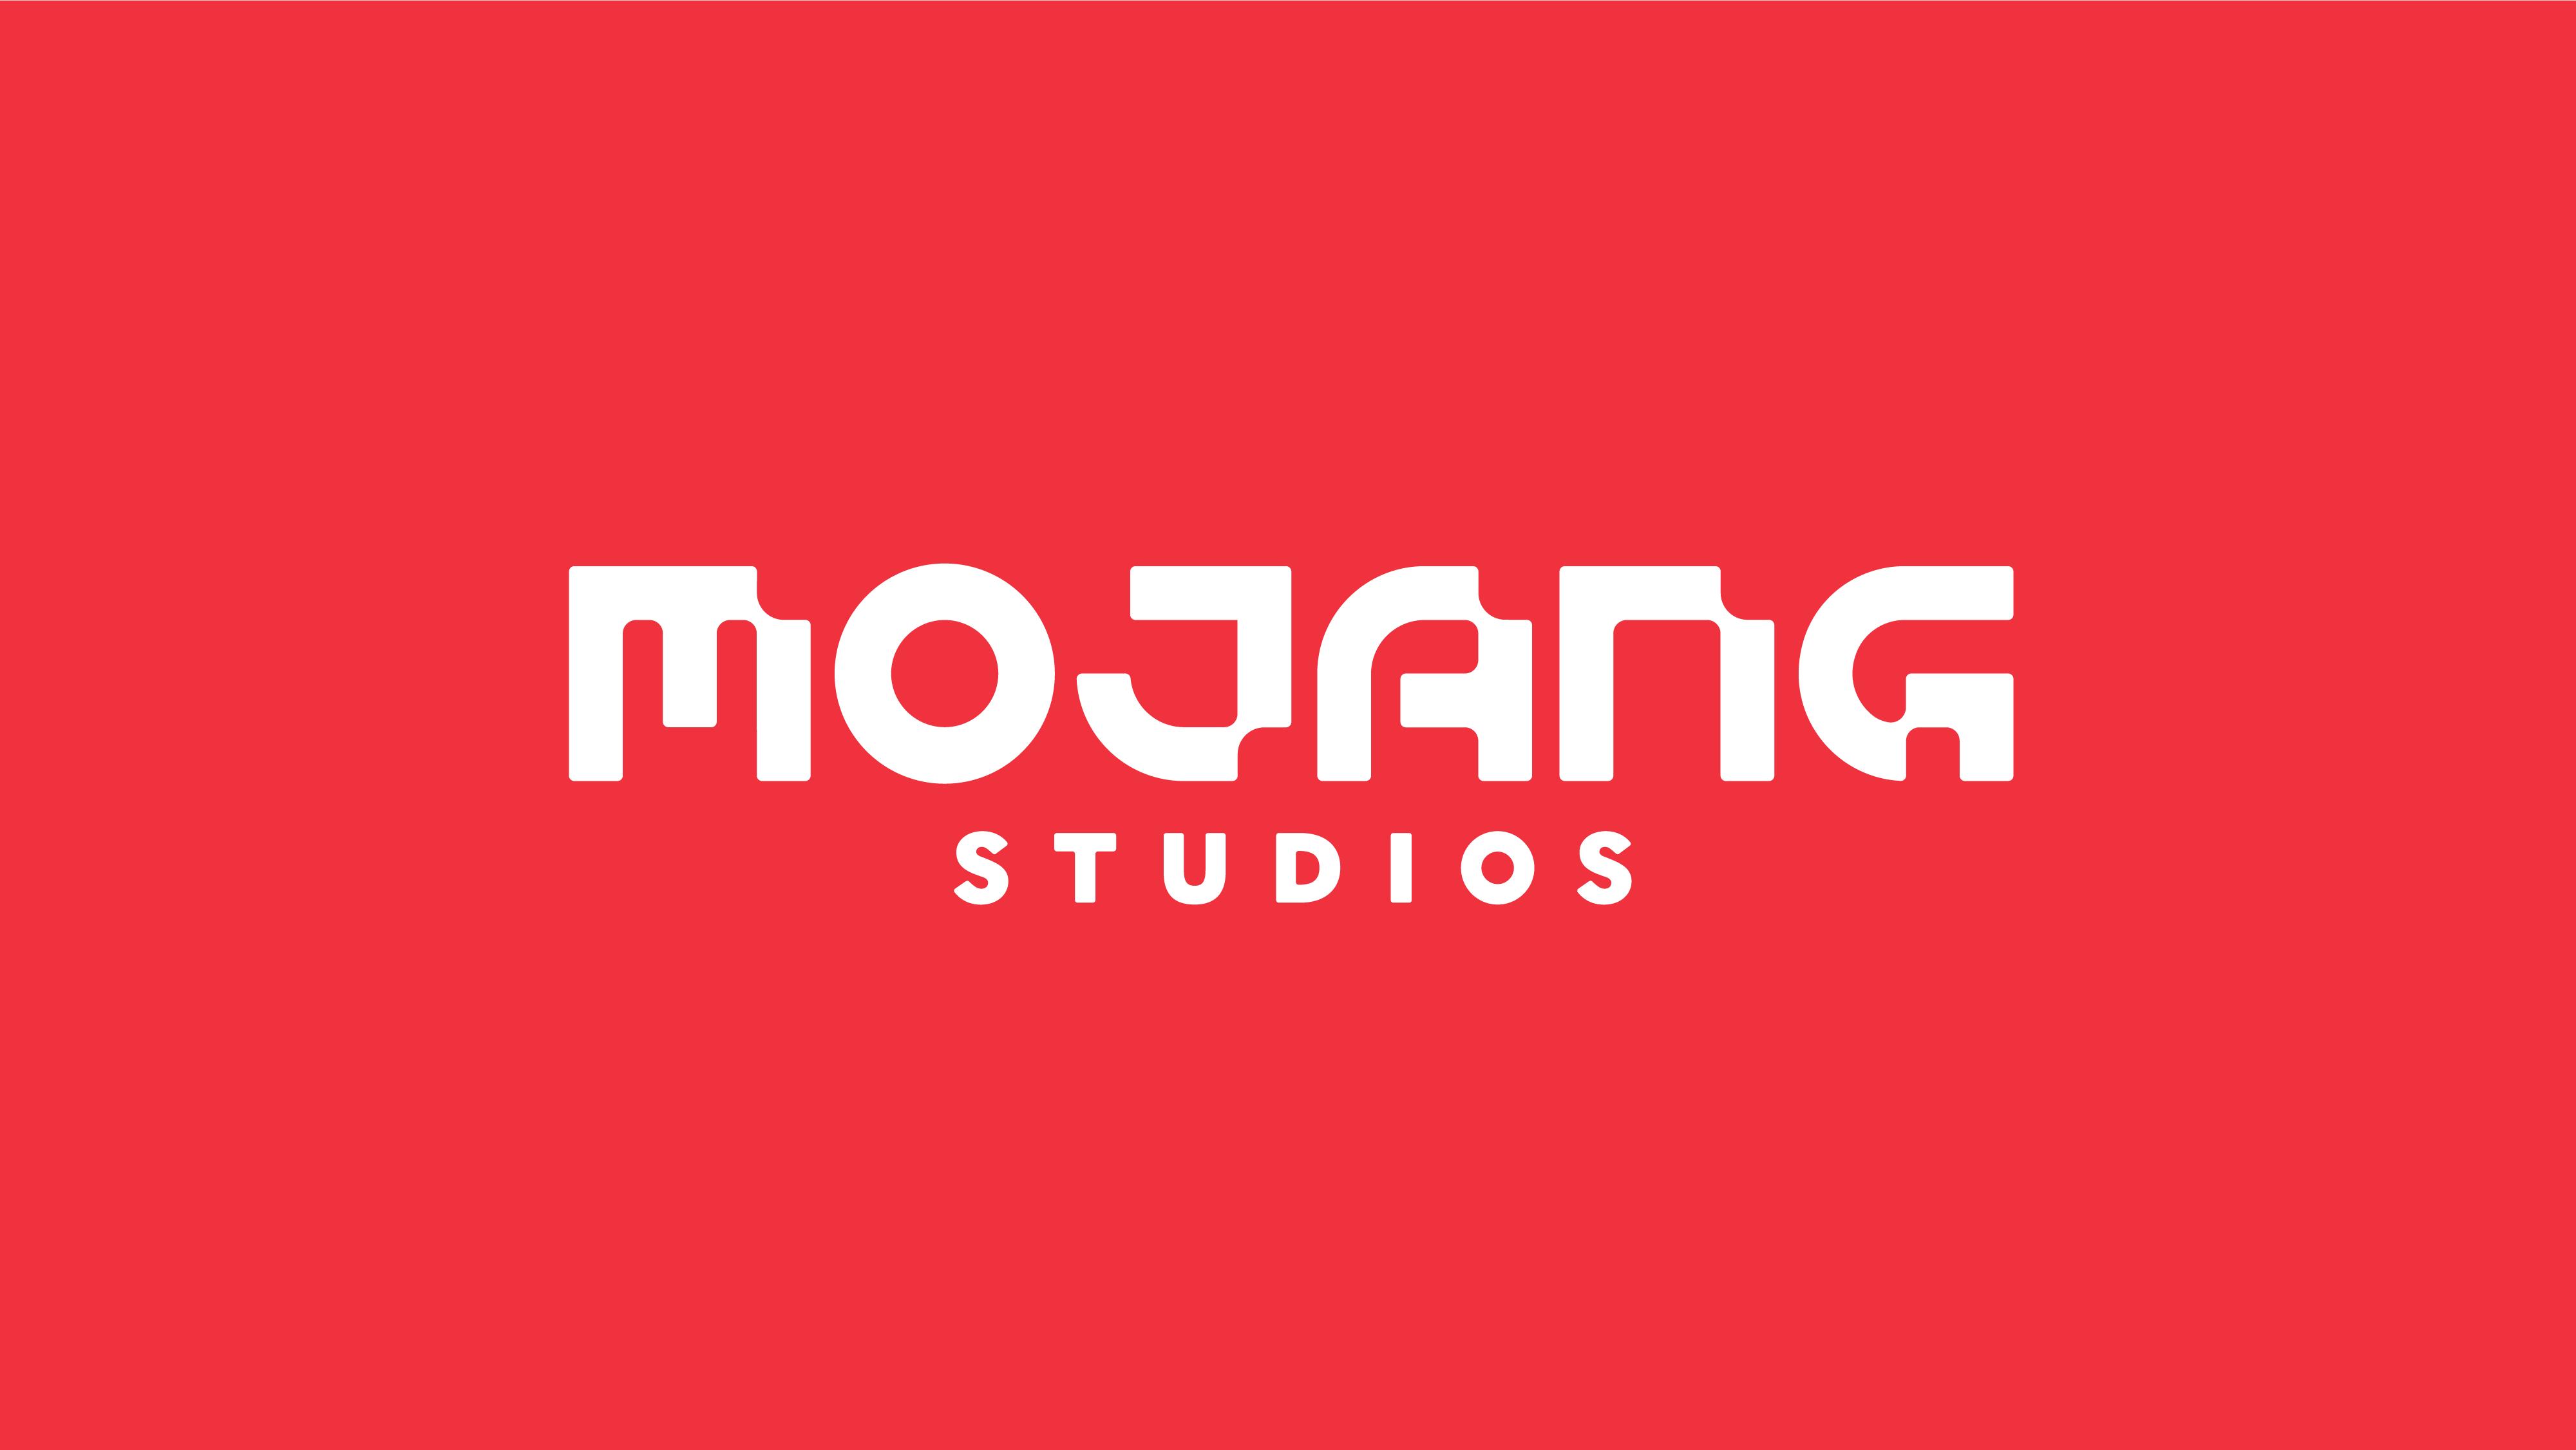 Mojang Studios Brand Identity